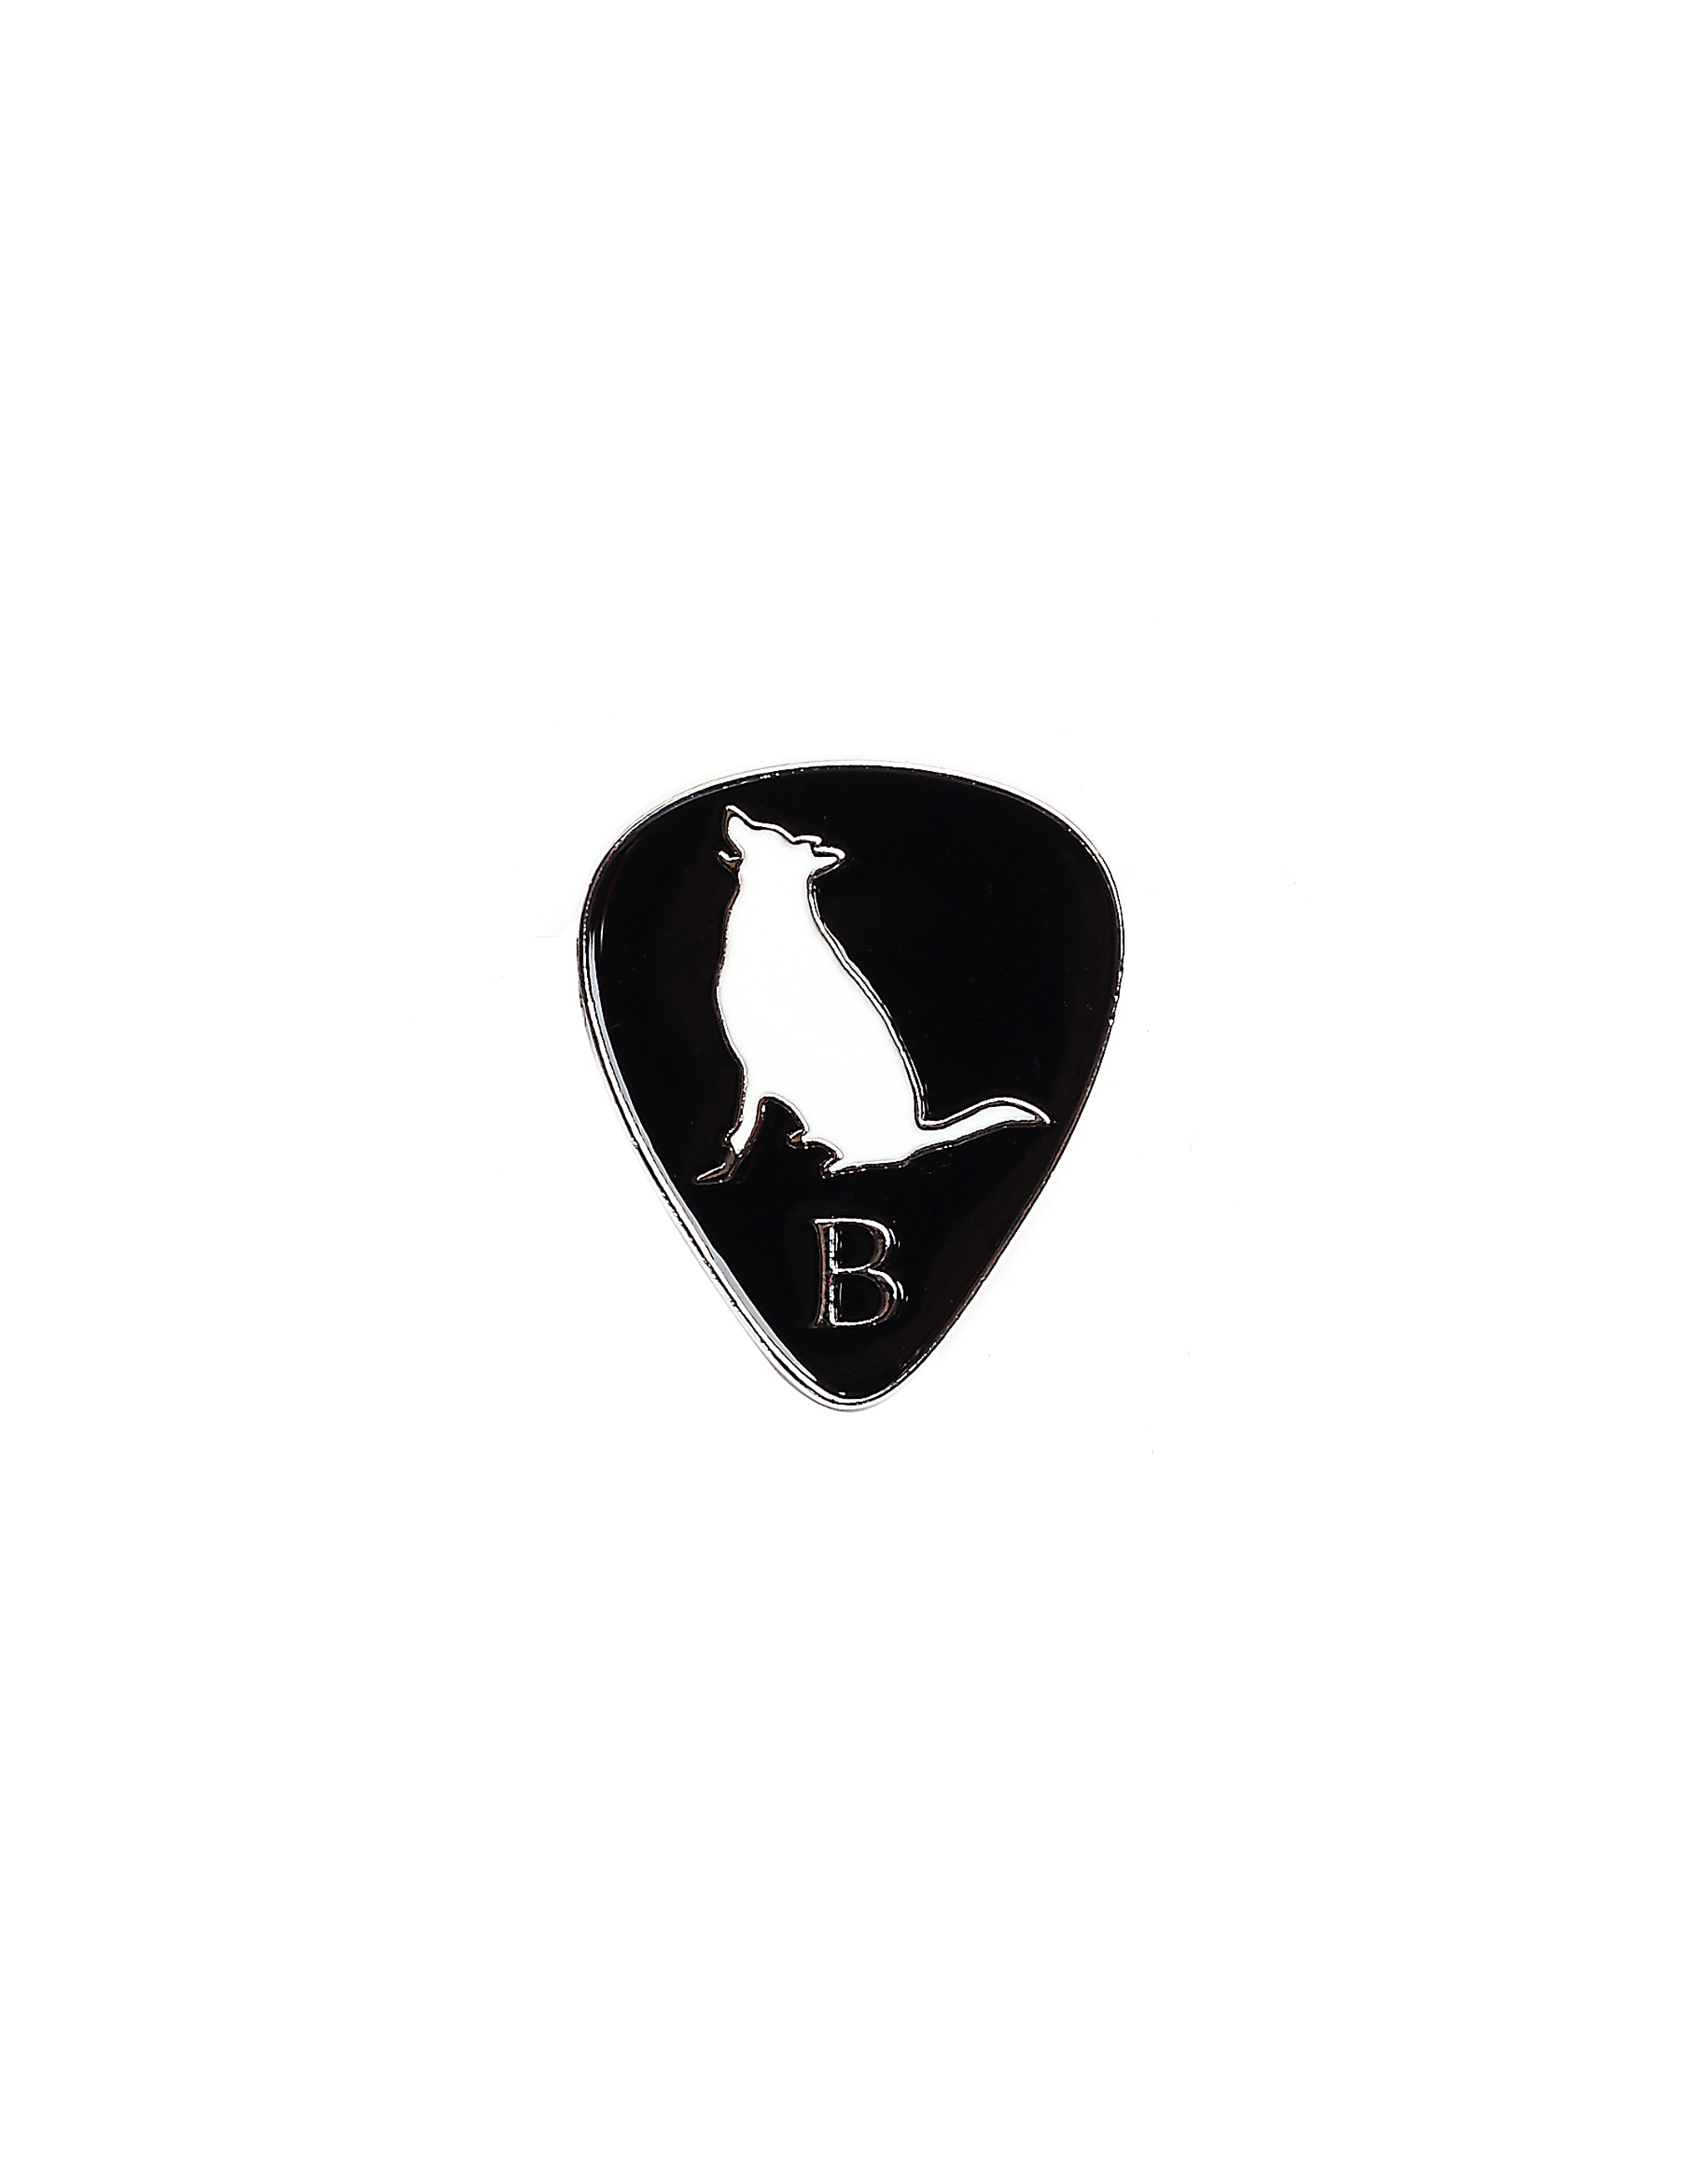 Yohji Yamamoto Guitar Pick Pin Badge